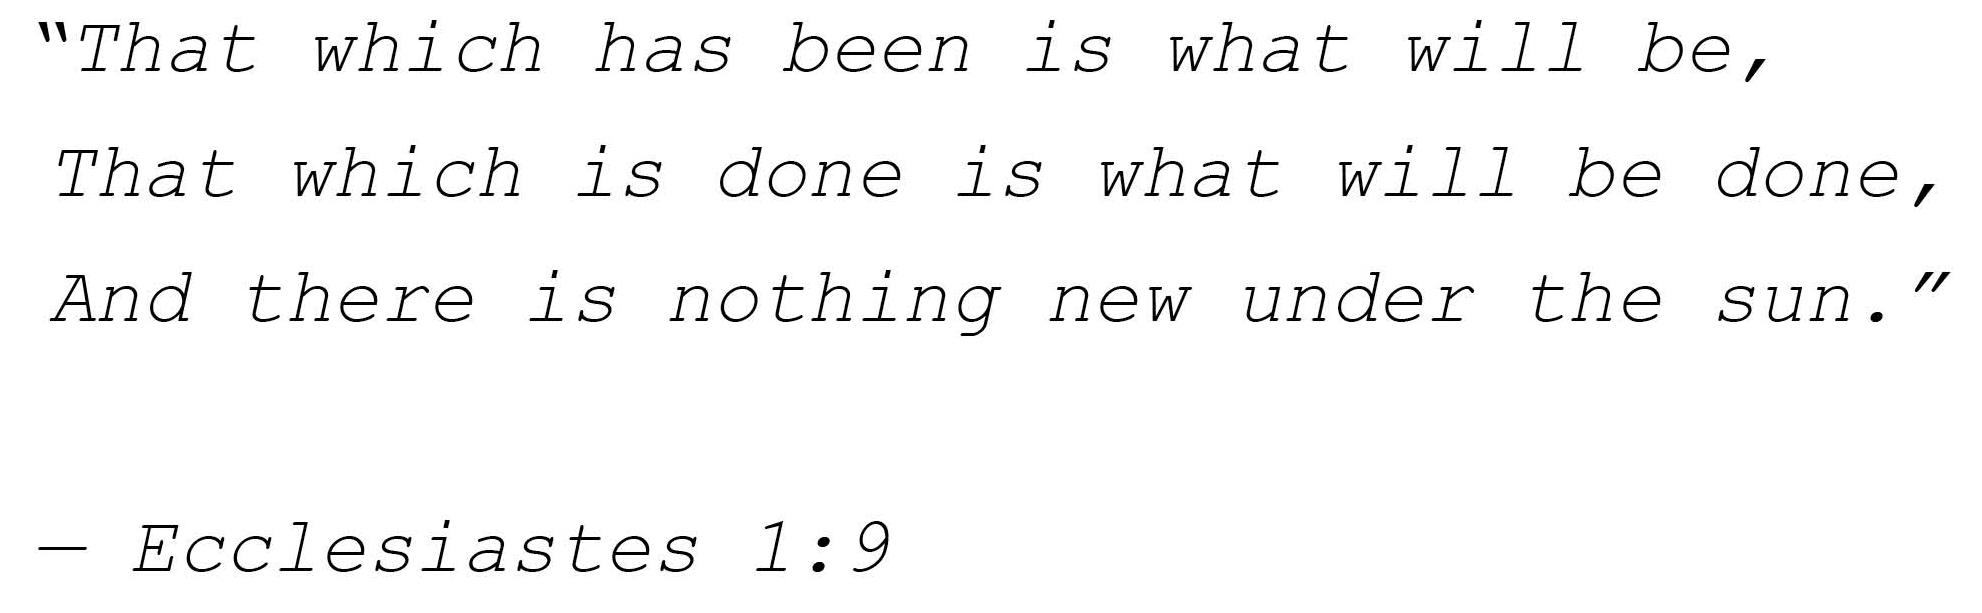 bible_quote.jpg